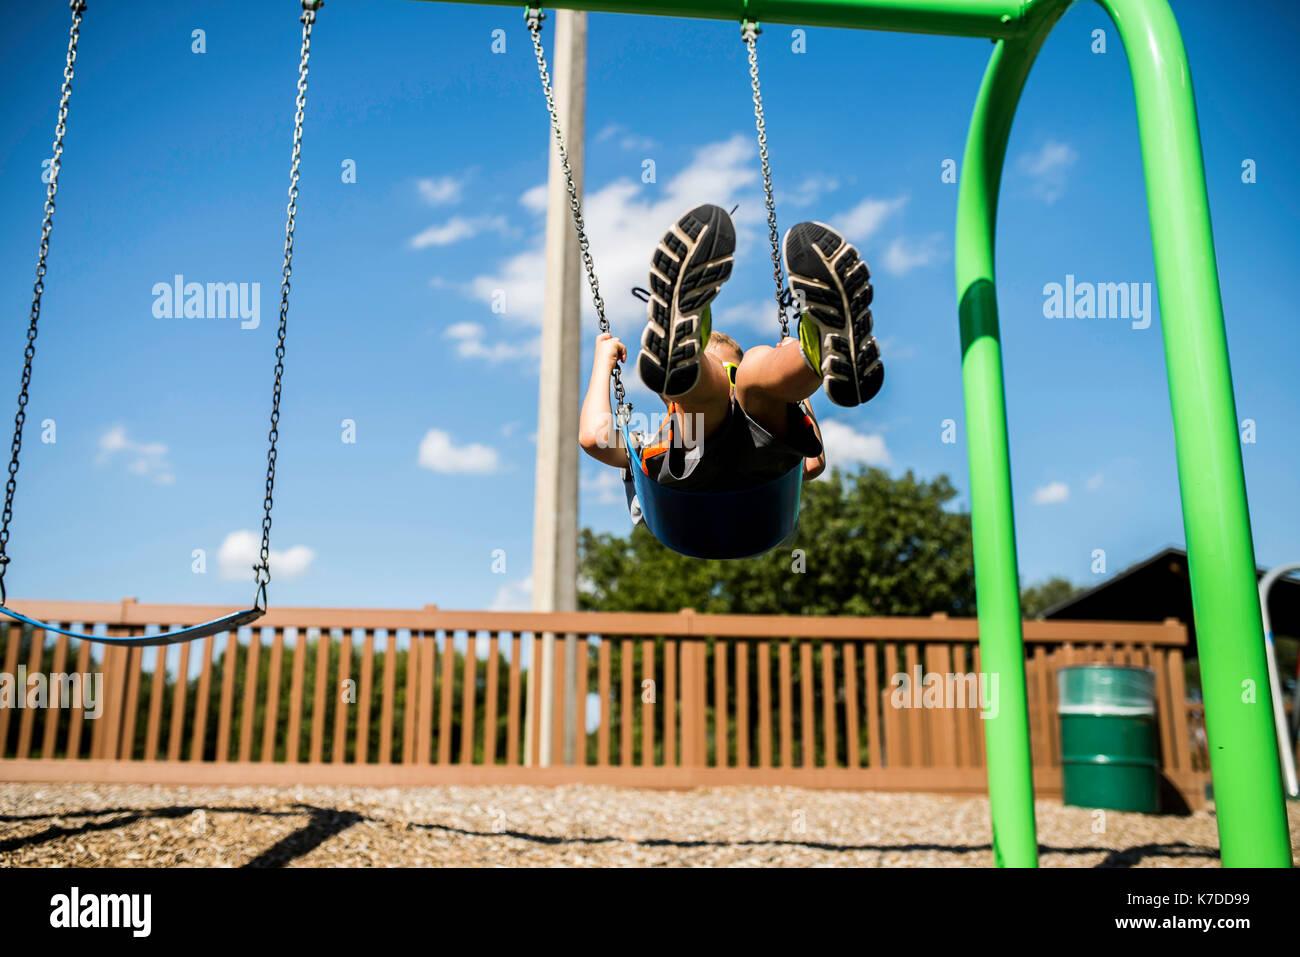 Boy swinging at playground during summer - Stock Image